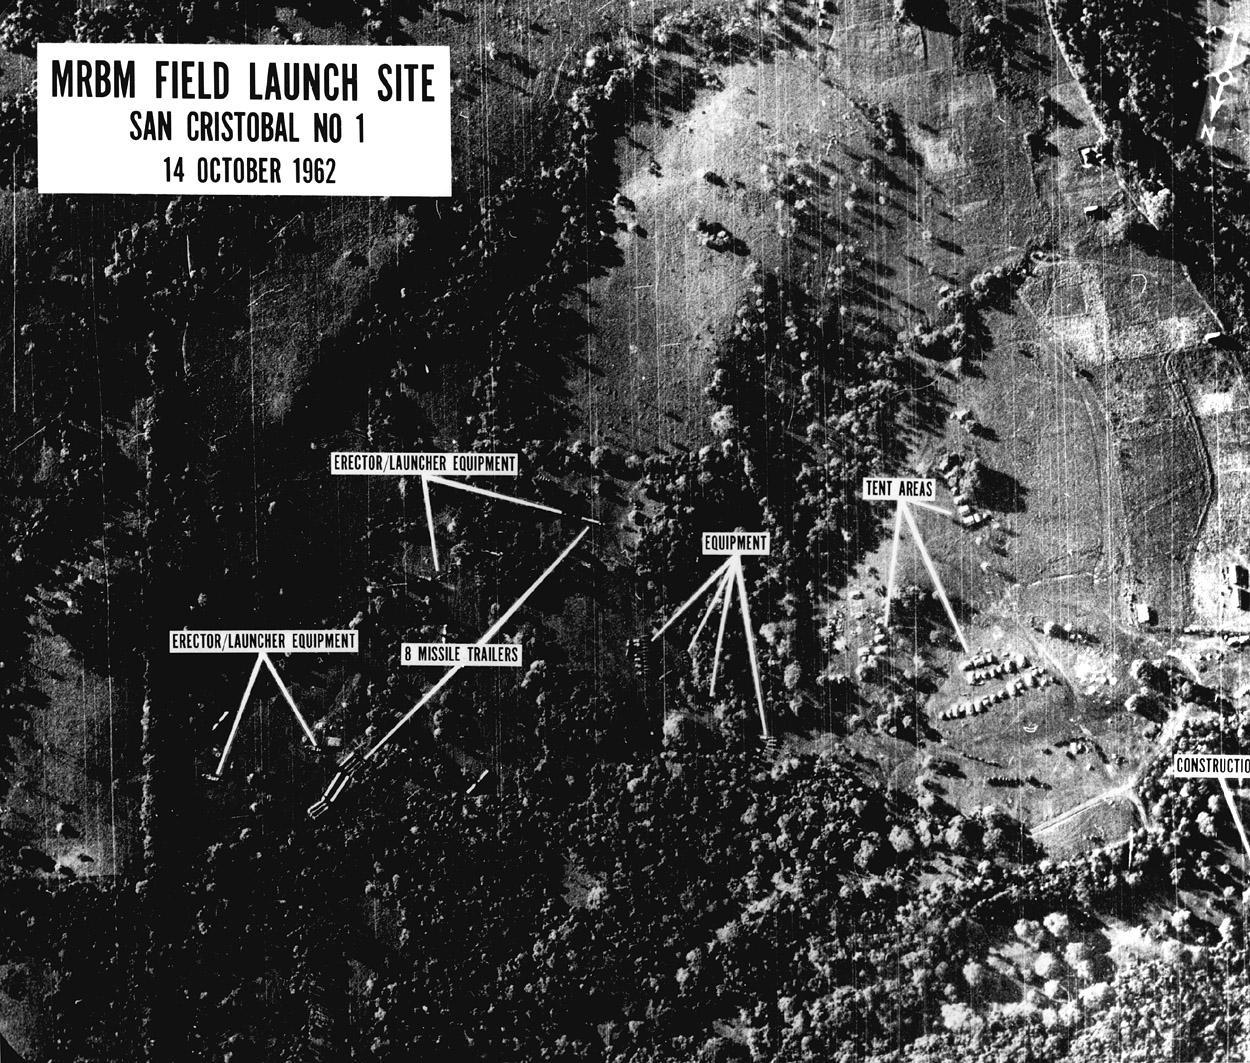 Cuba_Missiles_Crisis_U-2_photo.jpg?dur=1